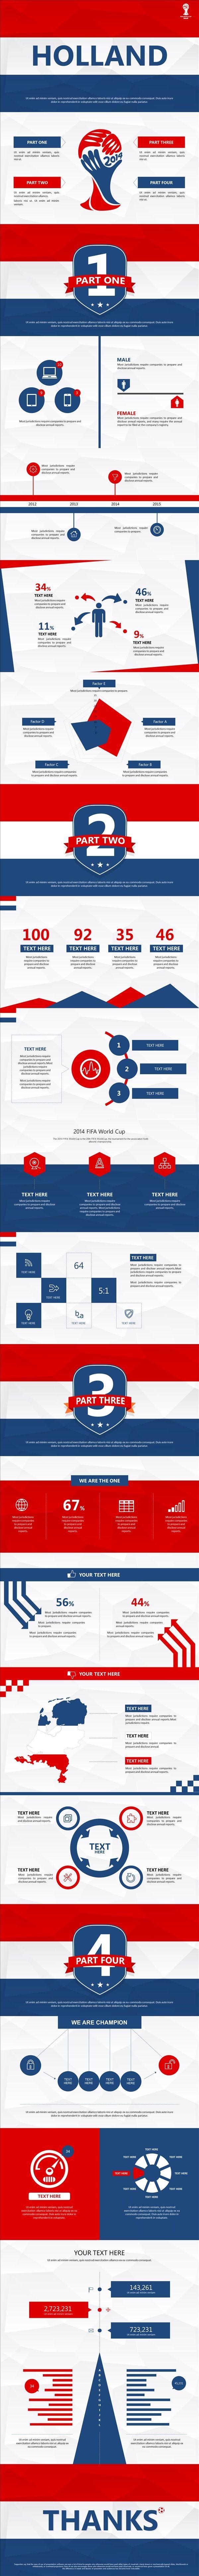 63 best presentation images on pinterest | brand design, layout, Presentation templates